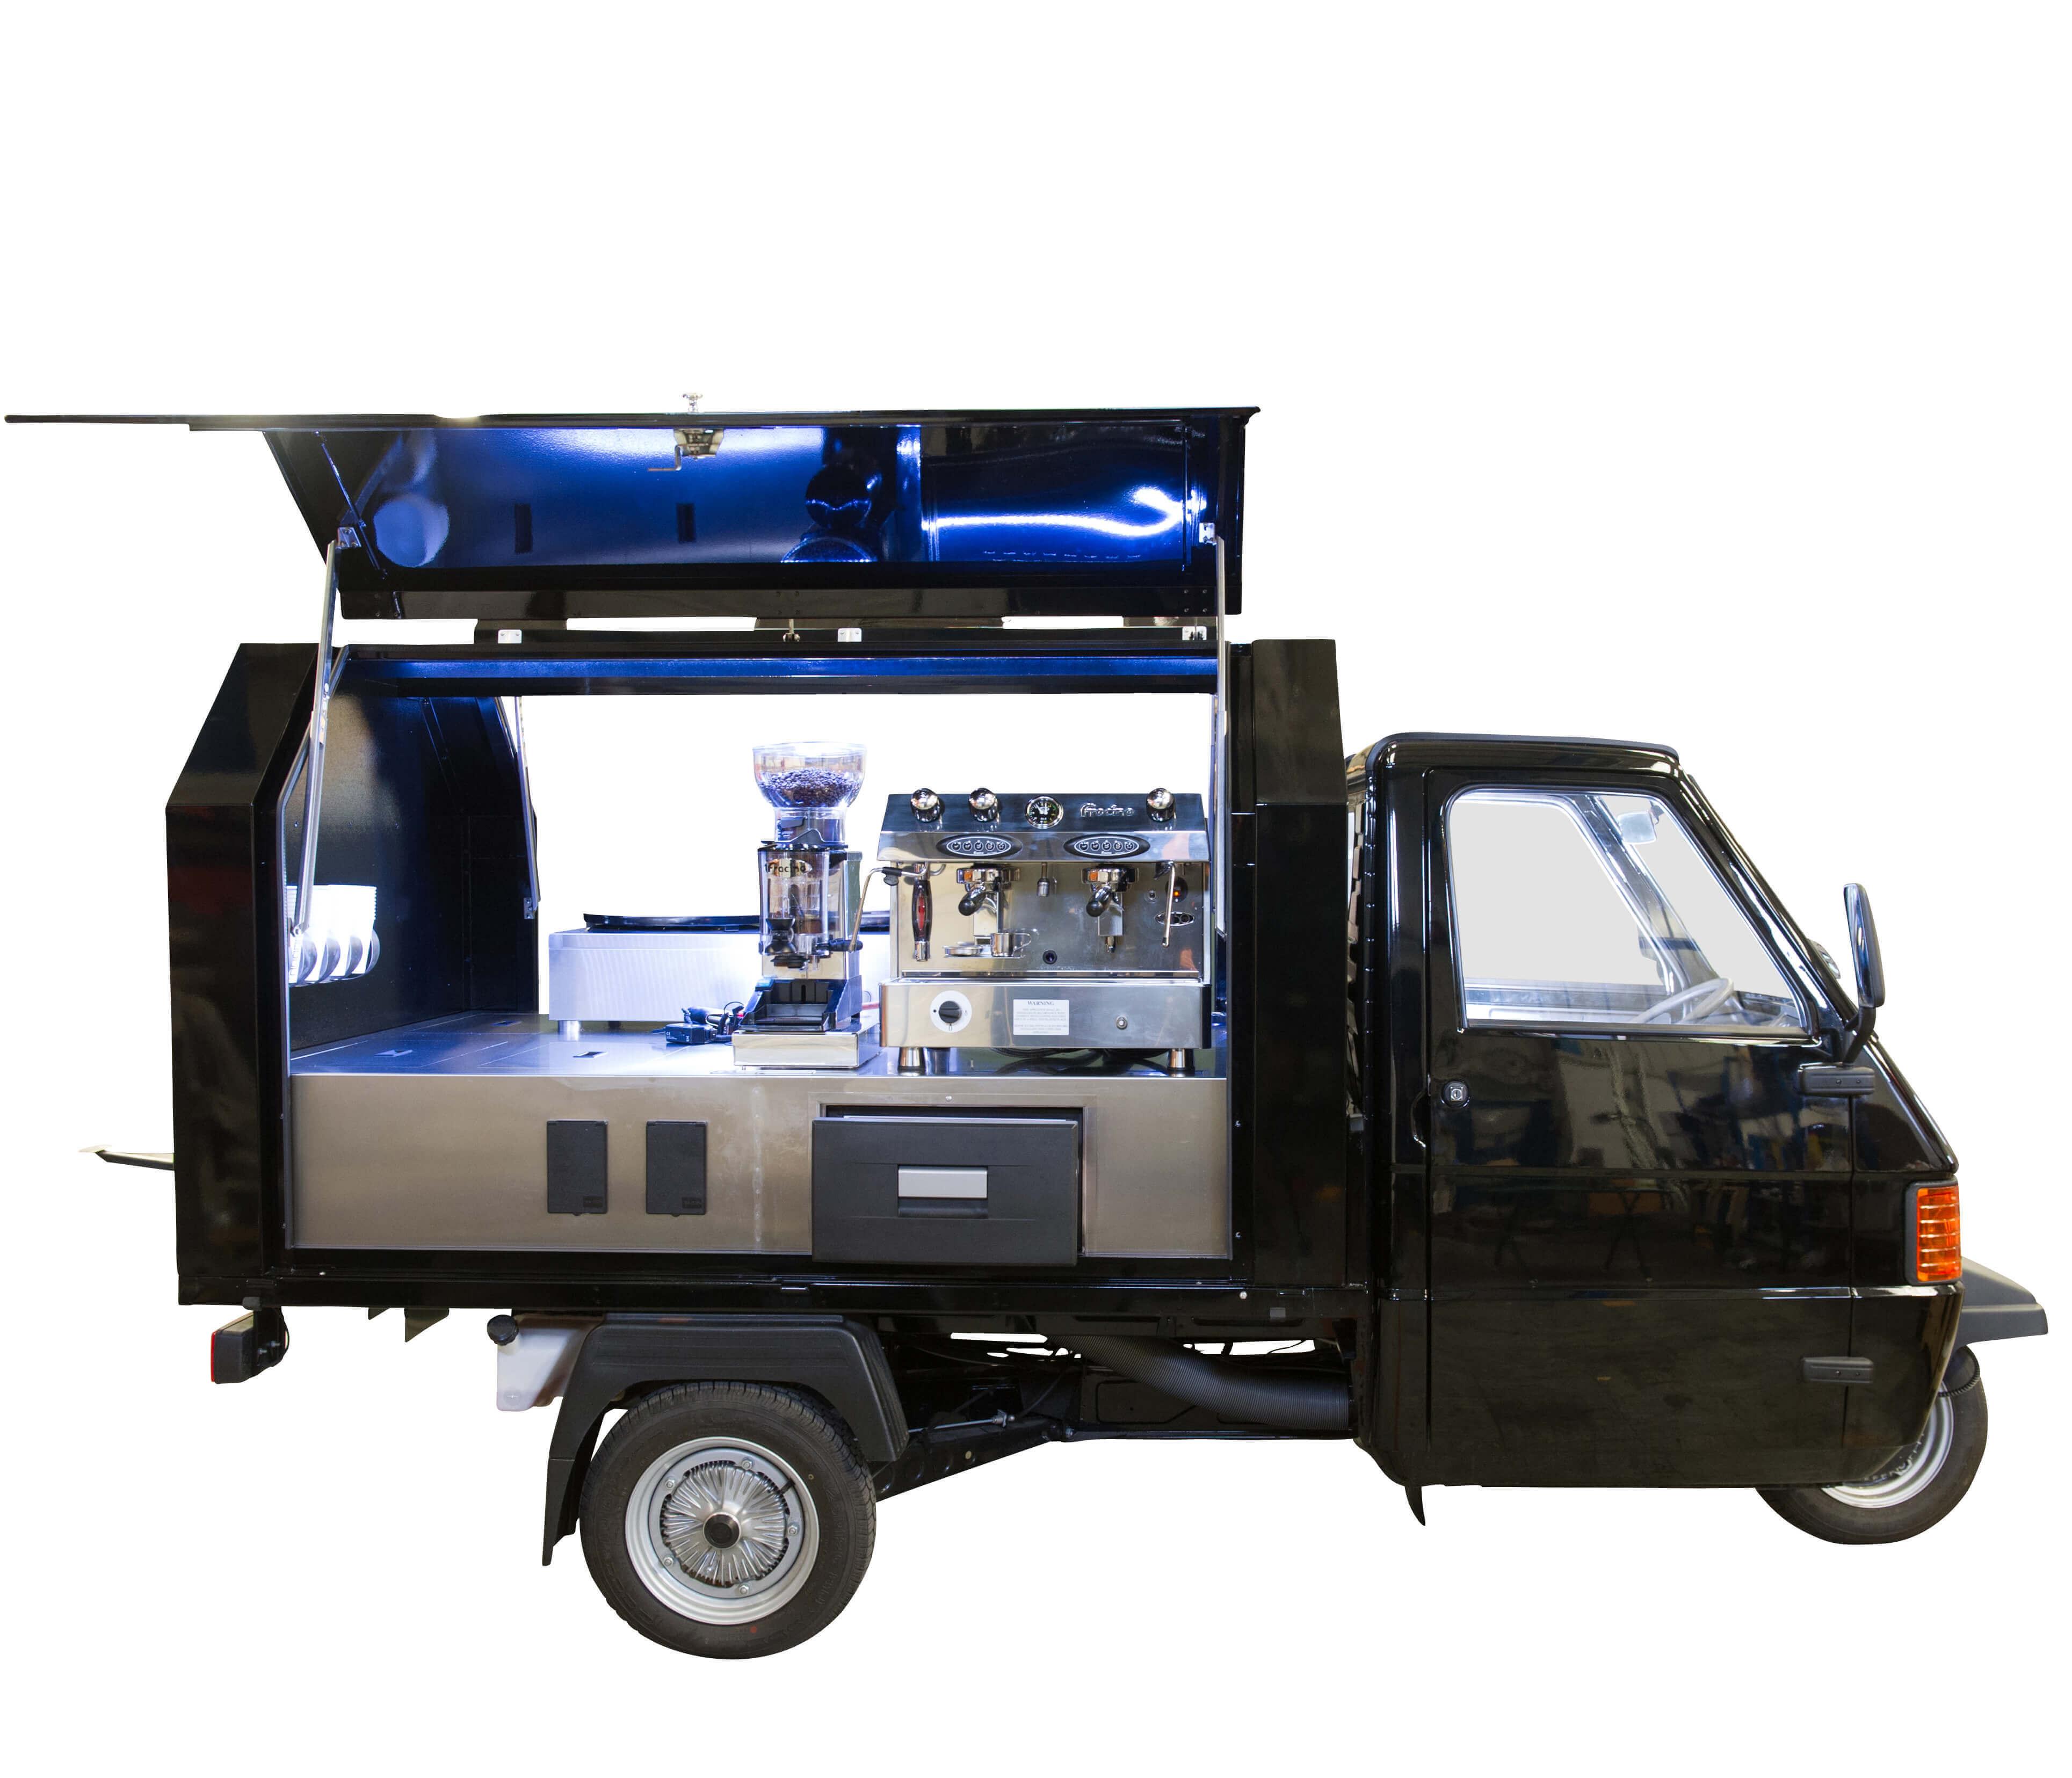 Ape 50 Gull Wing - Coffee Cart